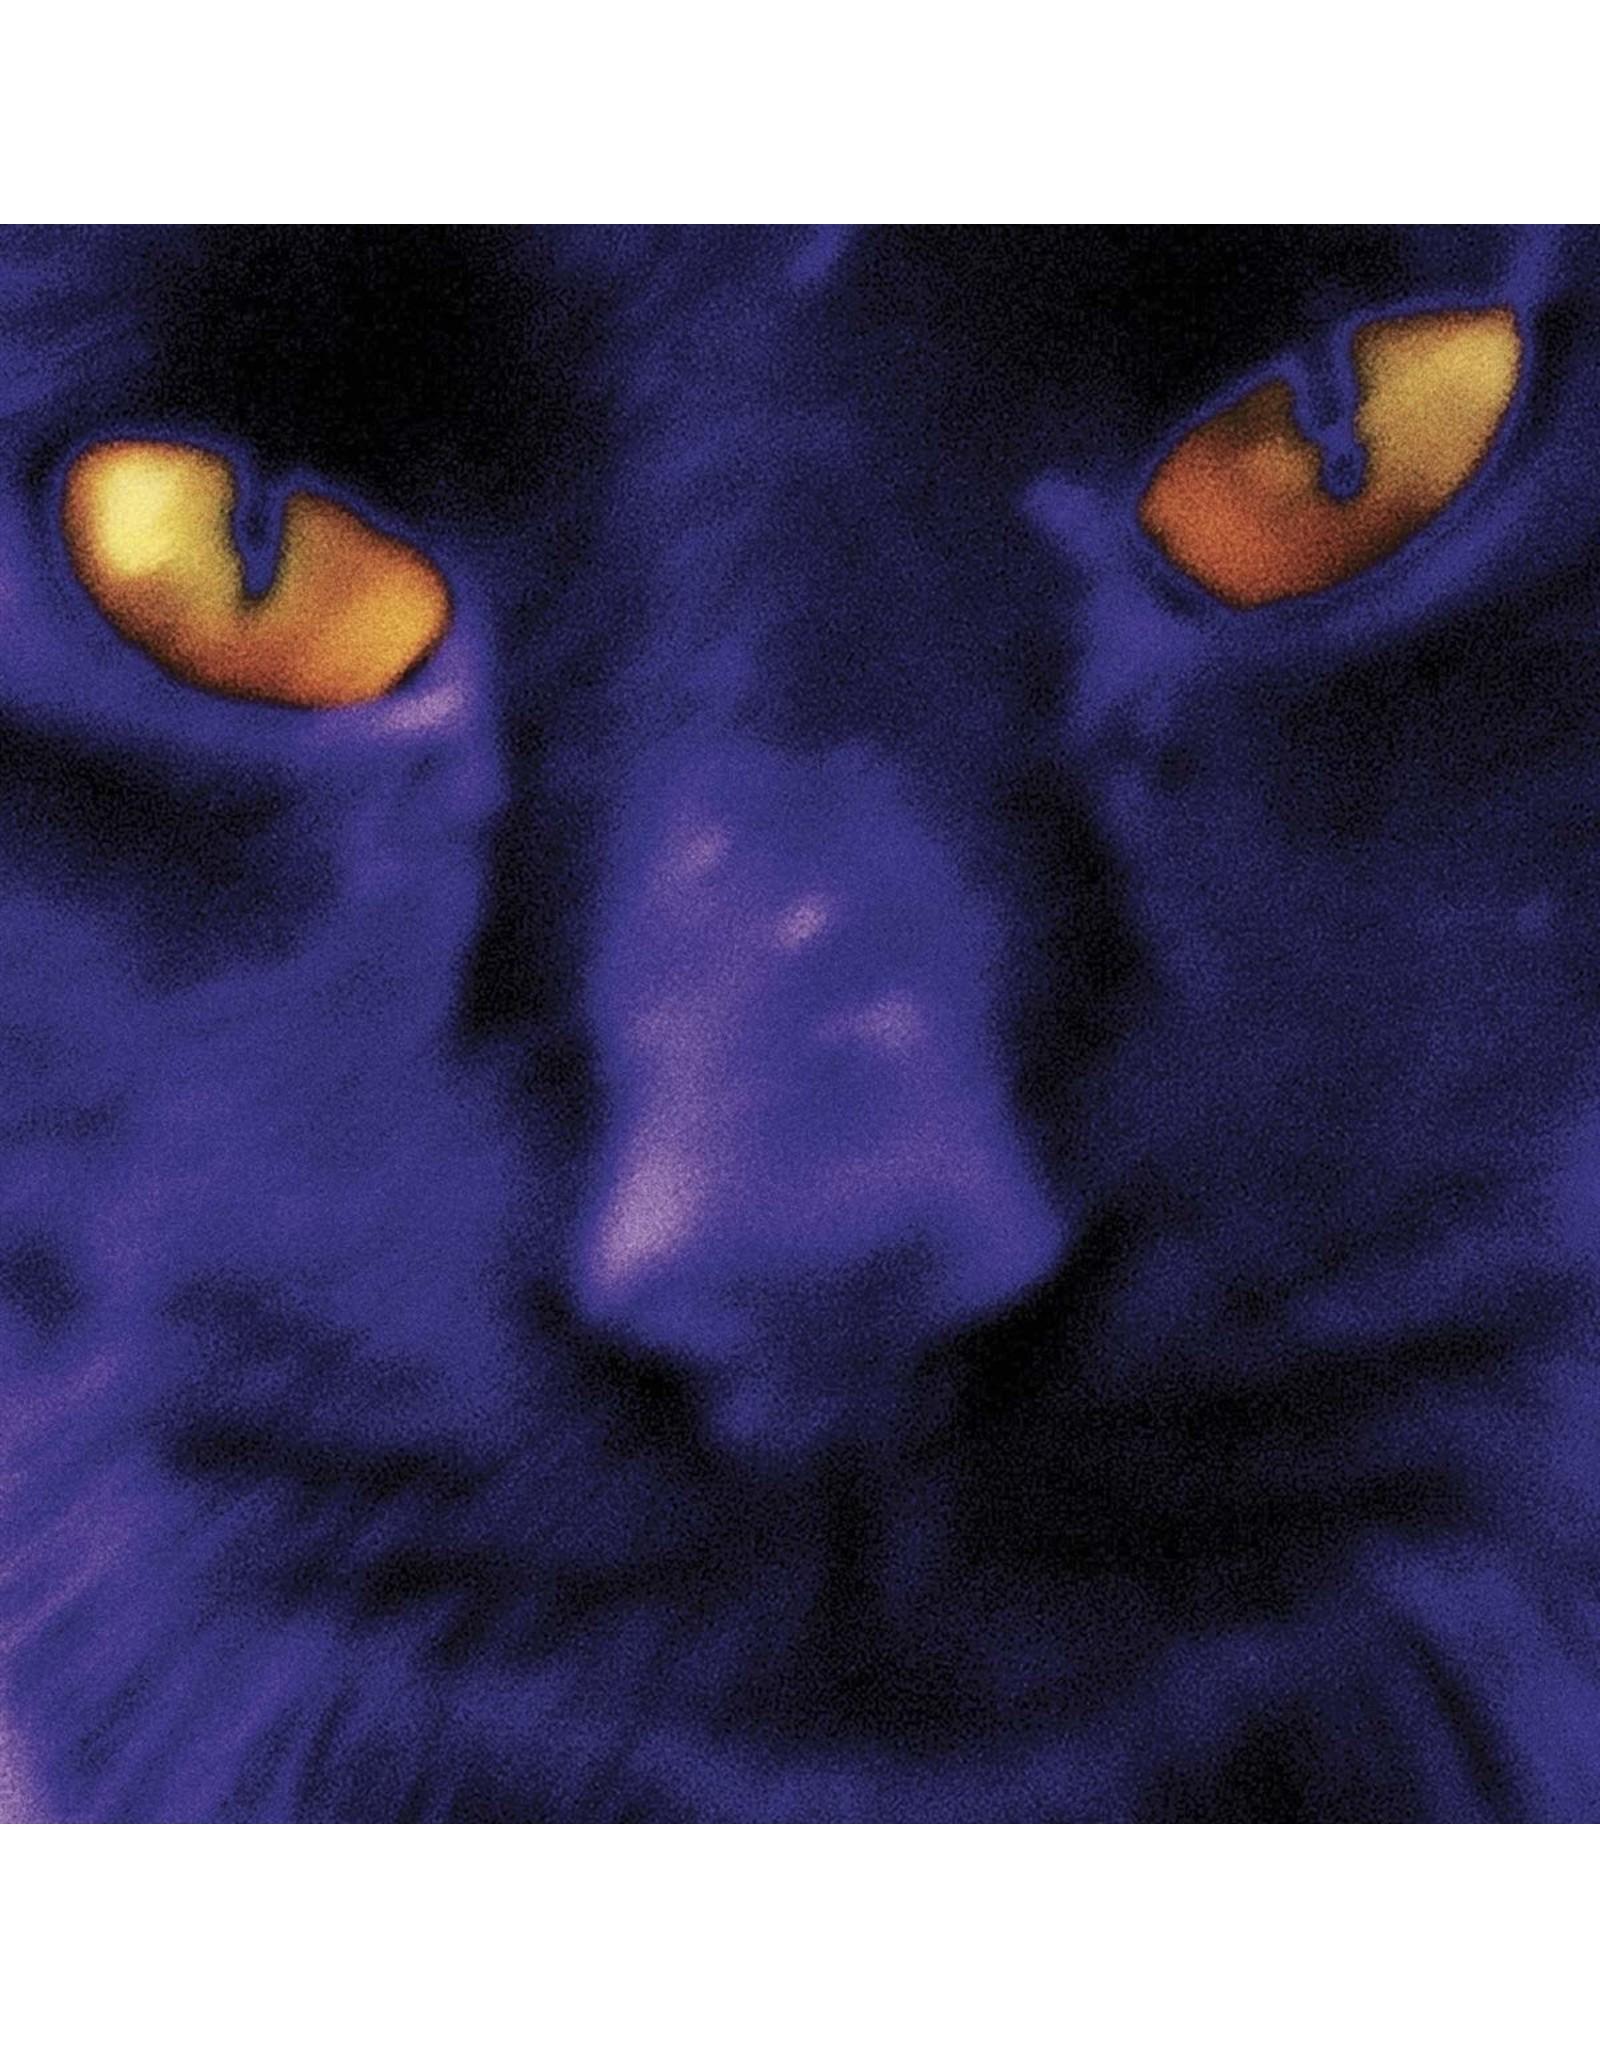 New Vinyl David Kilgour & The Heavy Eights - Bobbie's A Girl LP